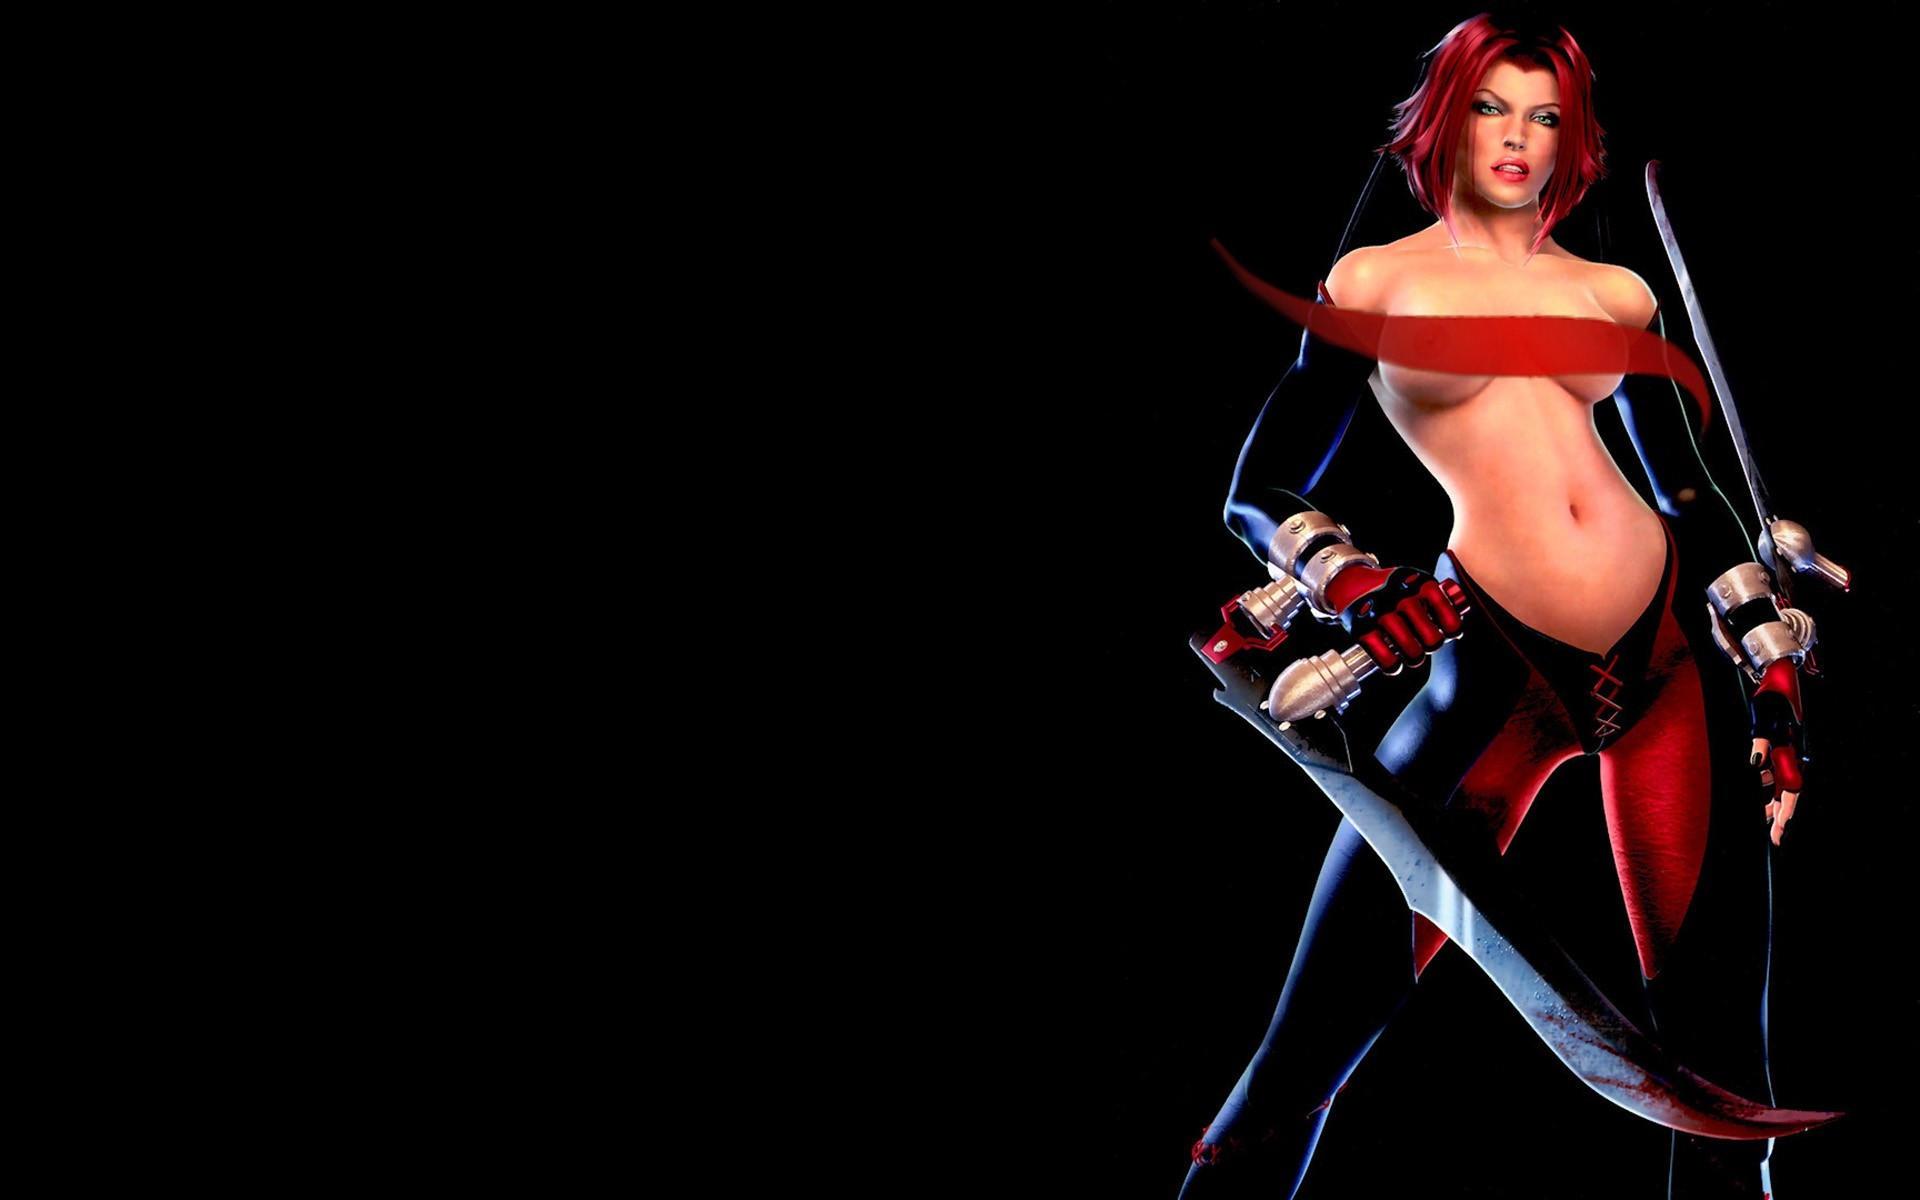 Эротические игры андроид онлайн 7 фотография